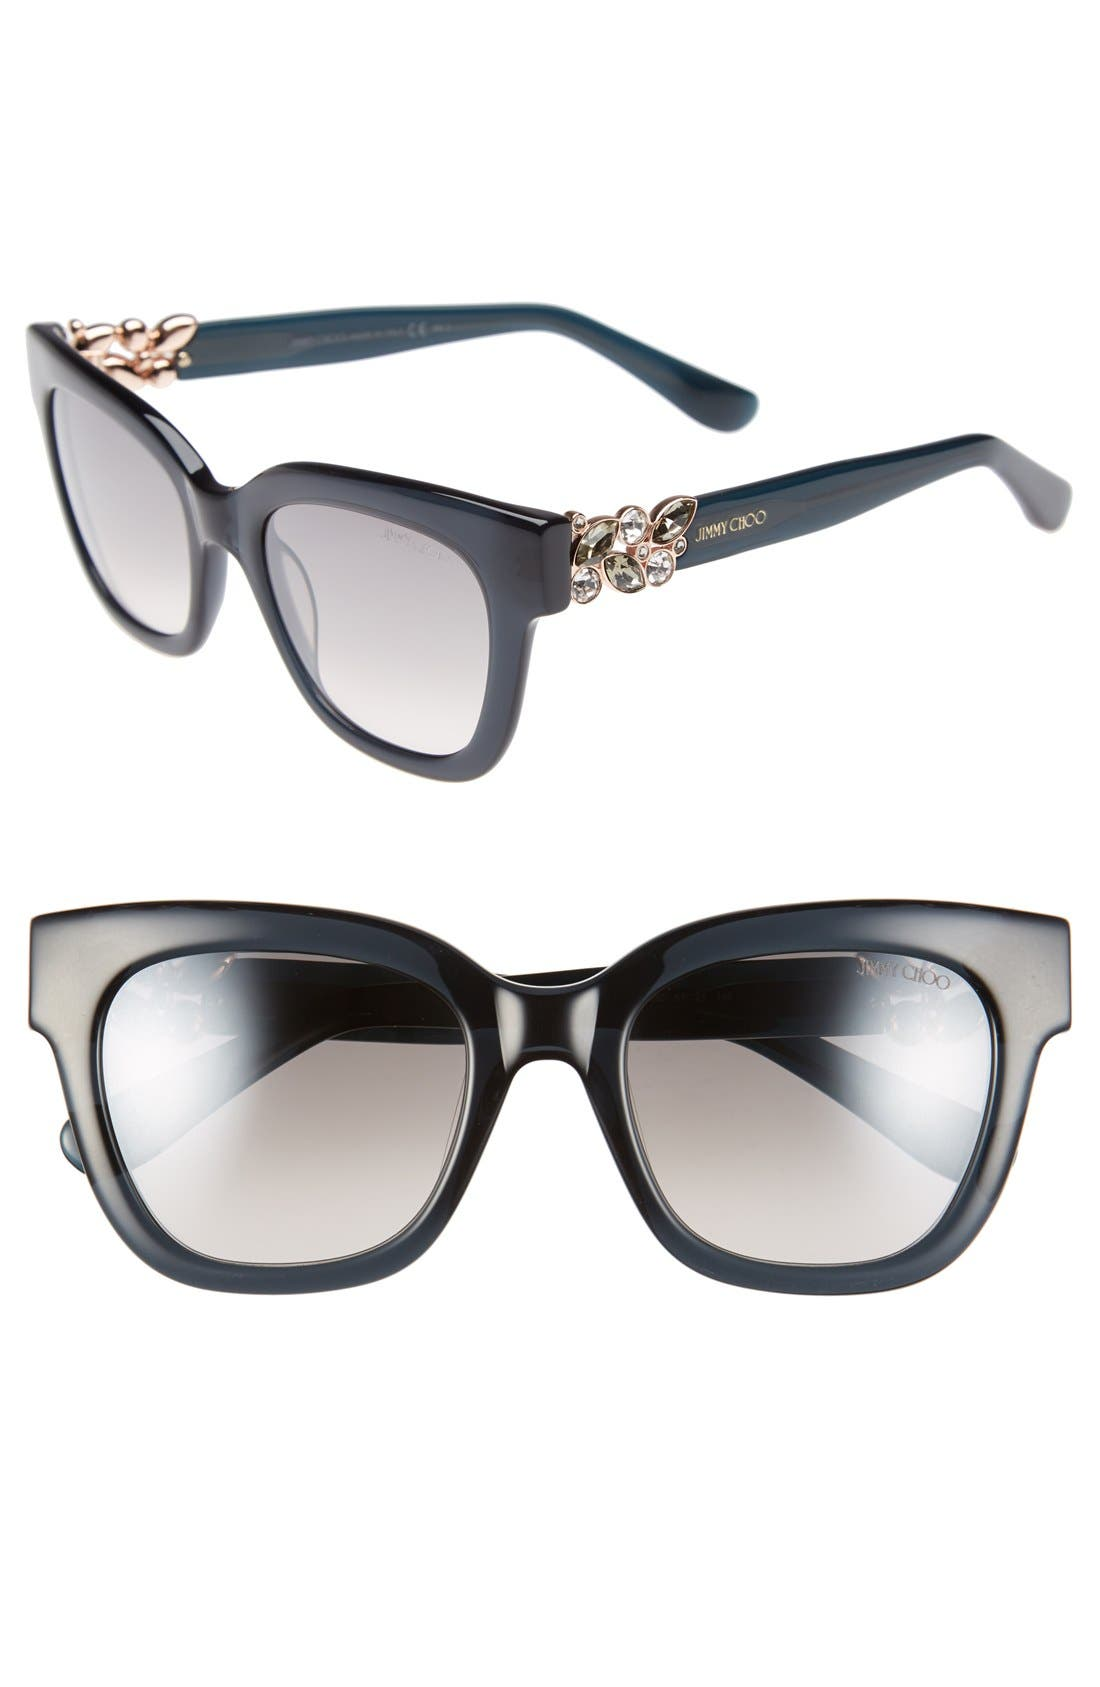 Main Image - Jimmy Choo 'Maggi' 51mm Crystal Embellished Sunglasses